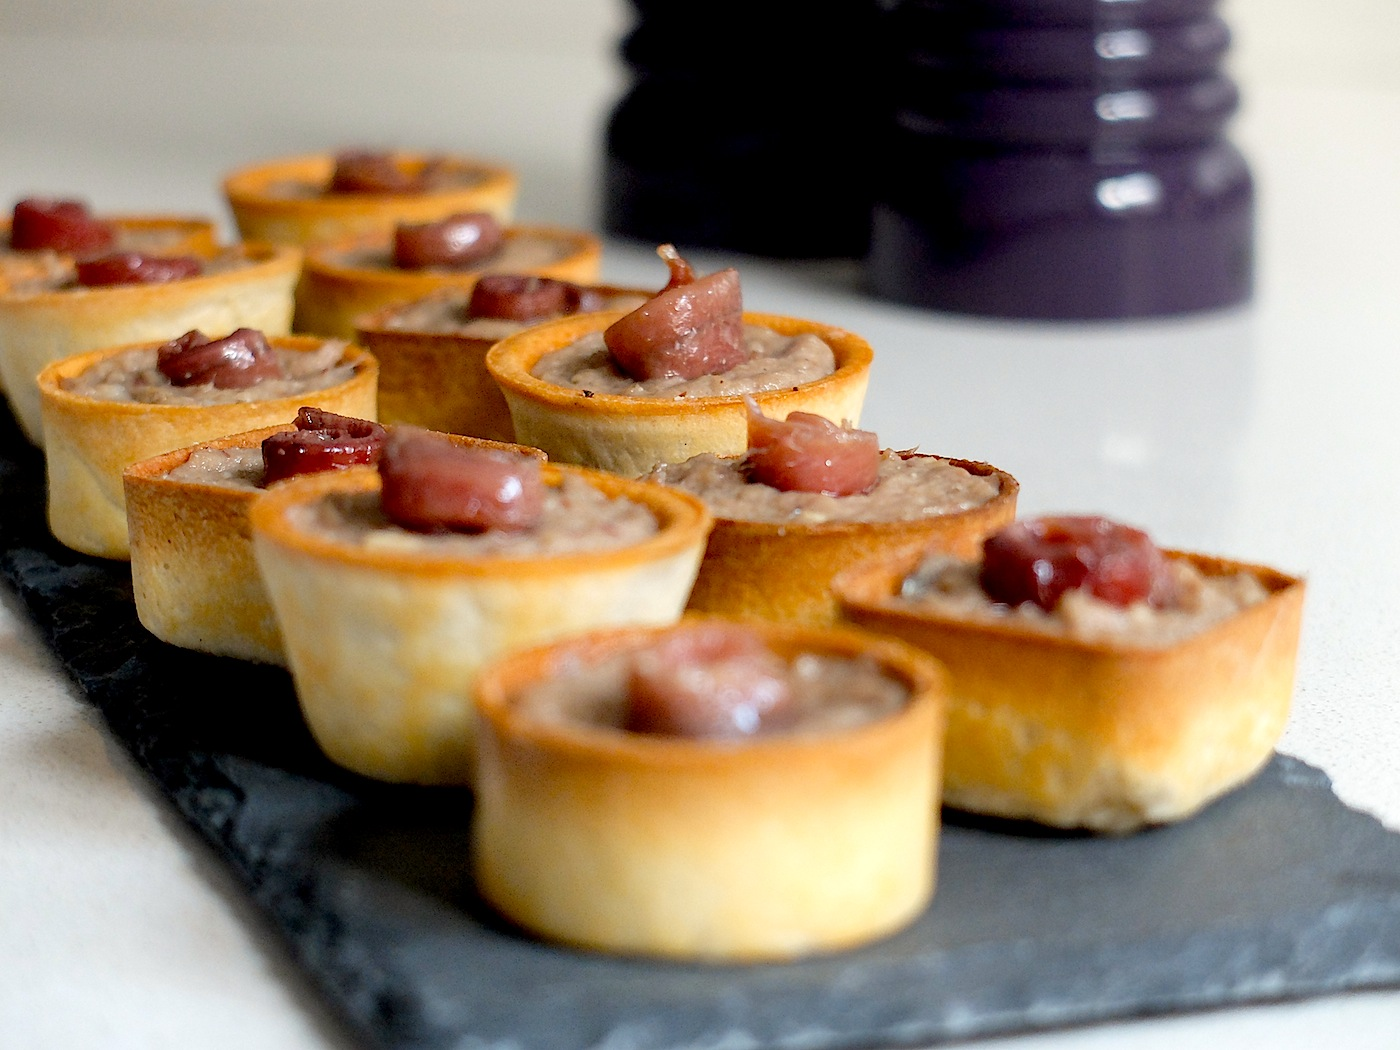 Canap s de pat de sardinillas y queso pixiecocina for Canape de pate con cebolla caramelizada